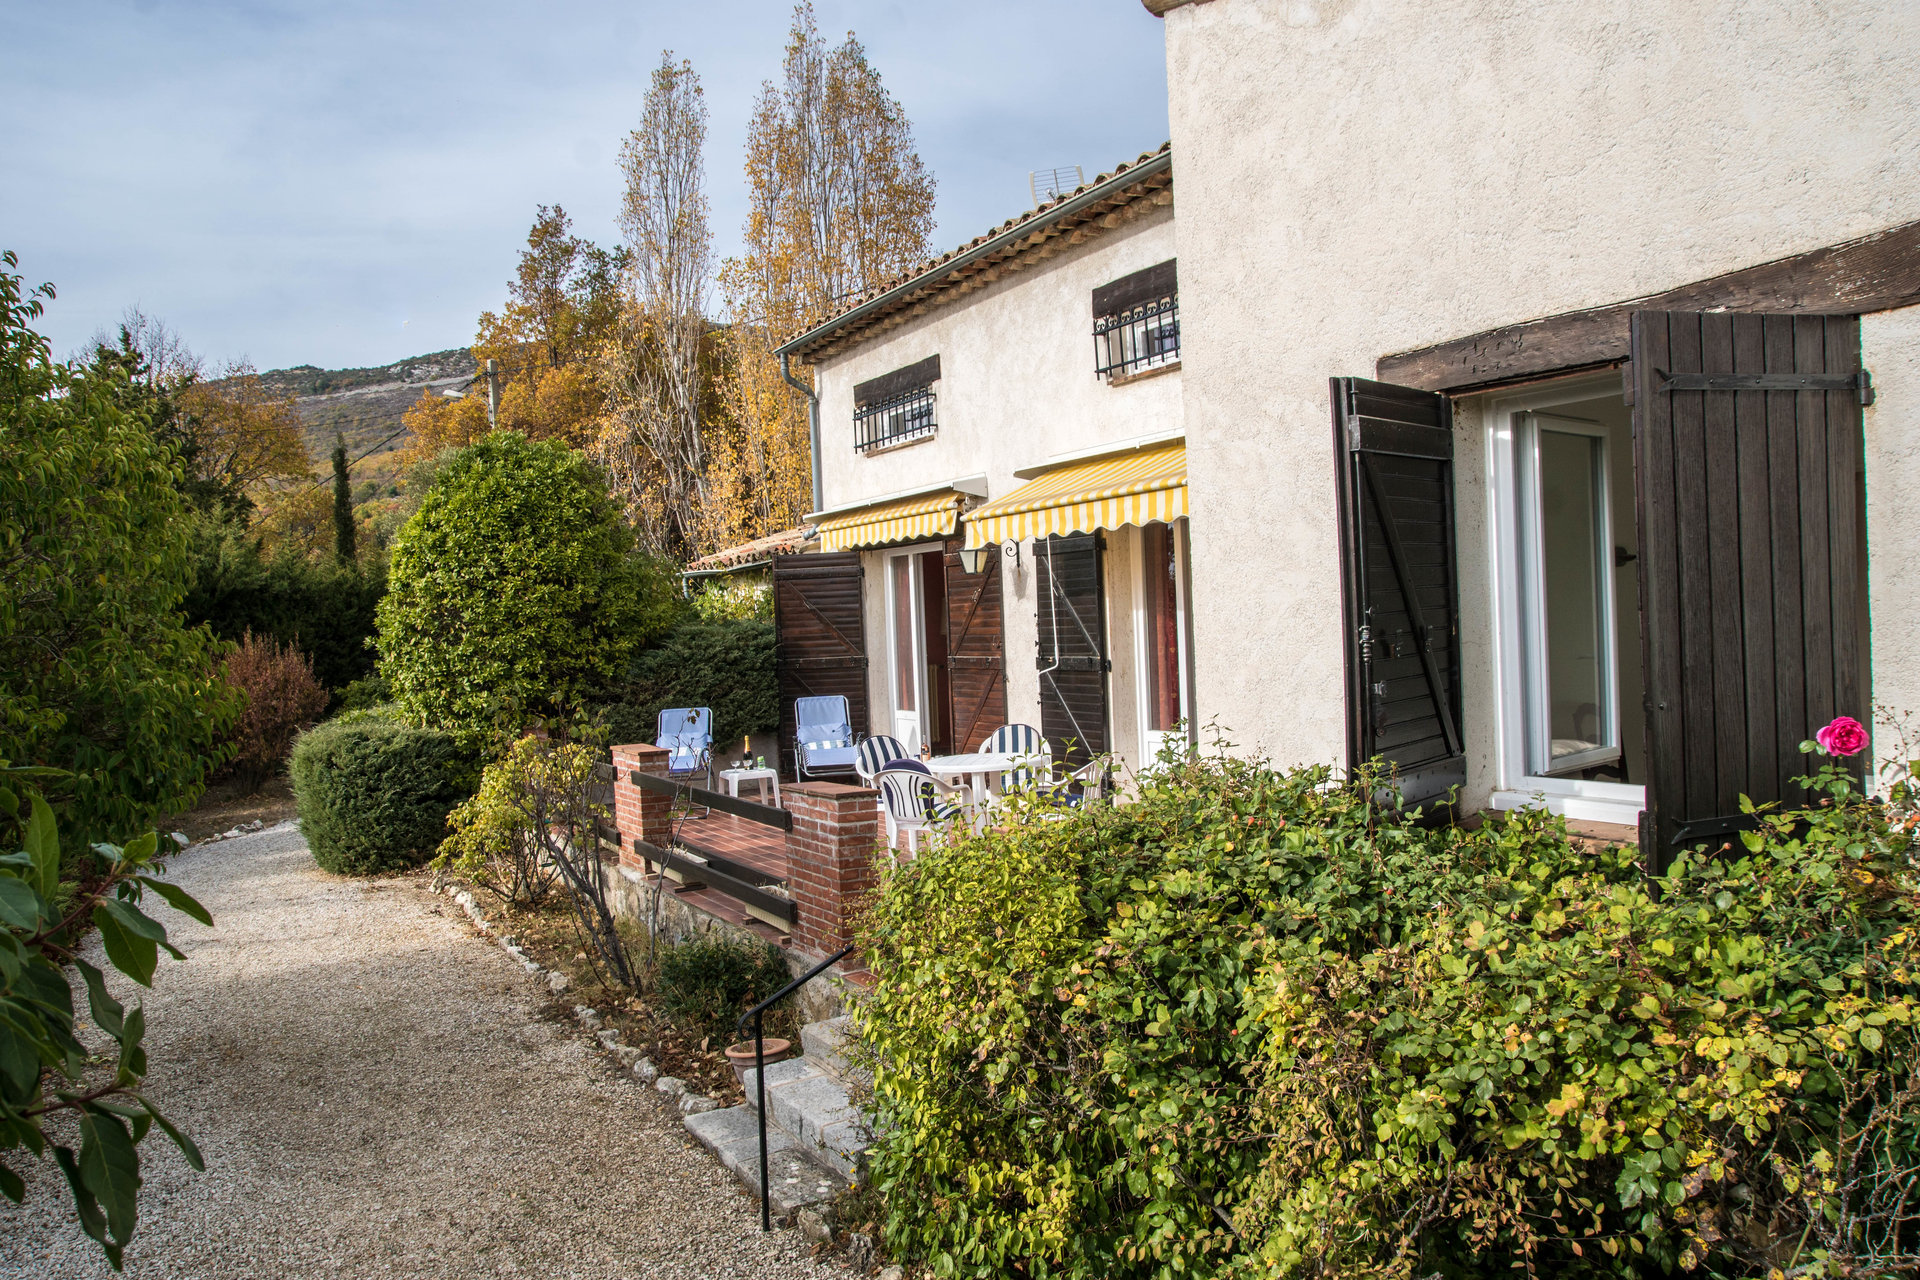 3 bed rooms villa ,at Saint vallier de thiey